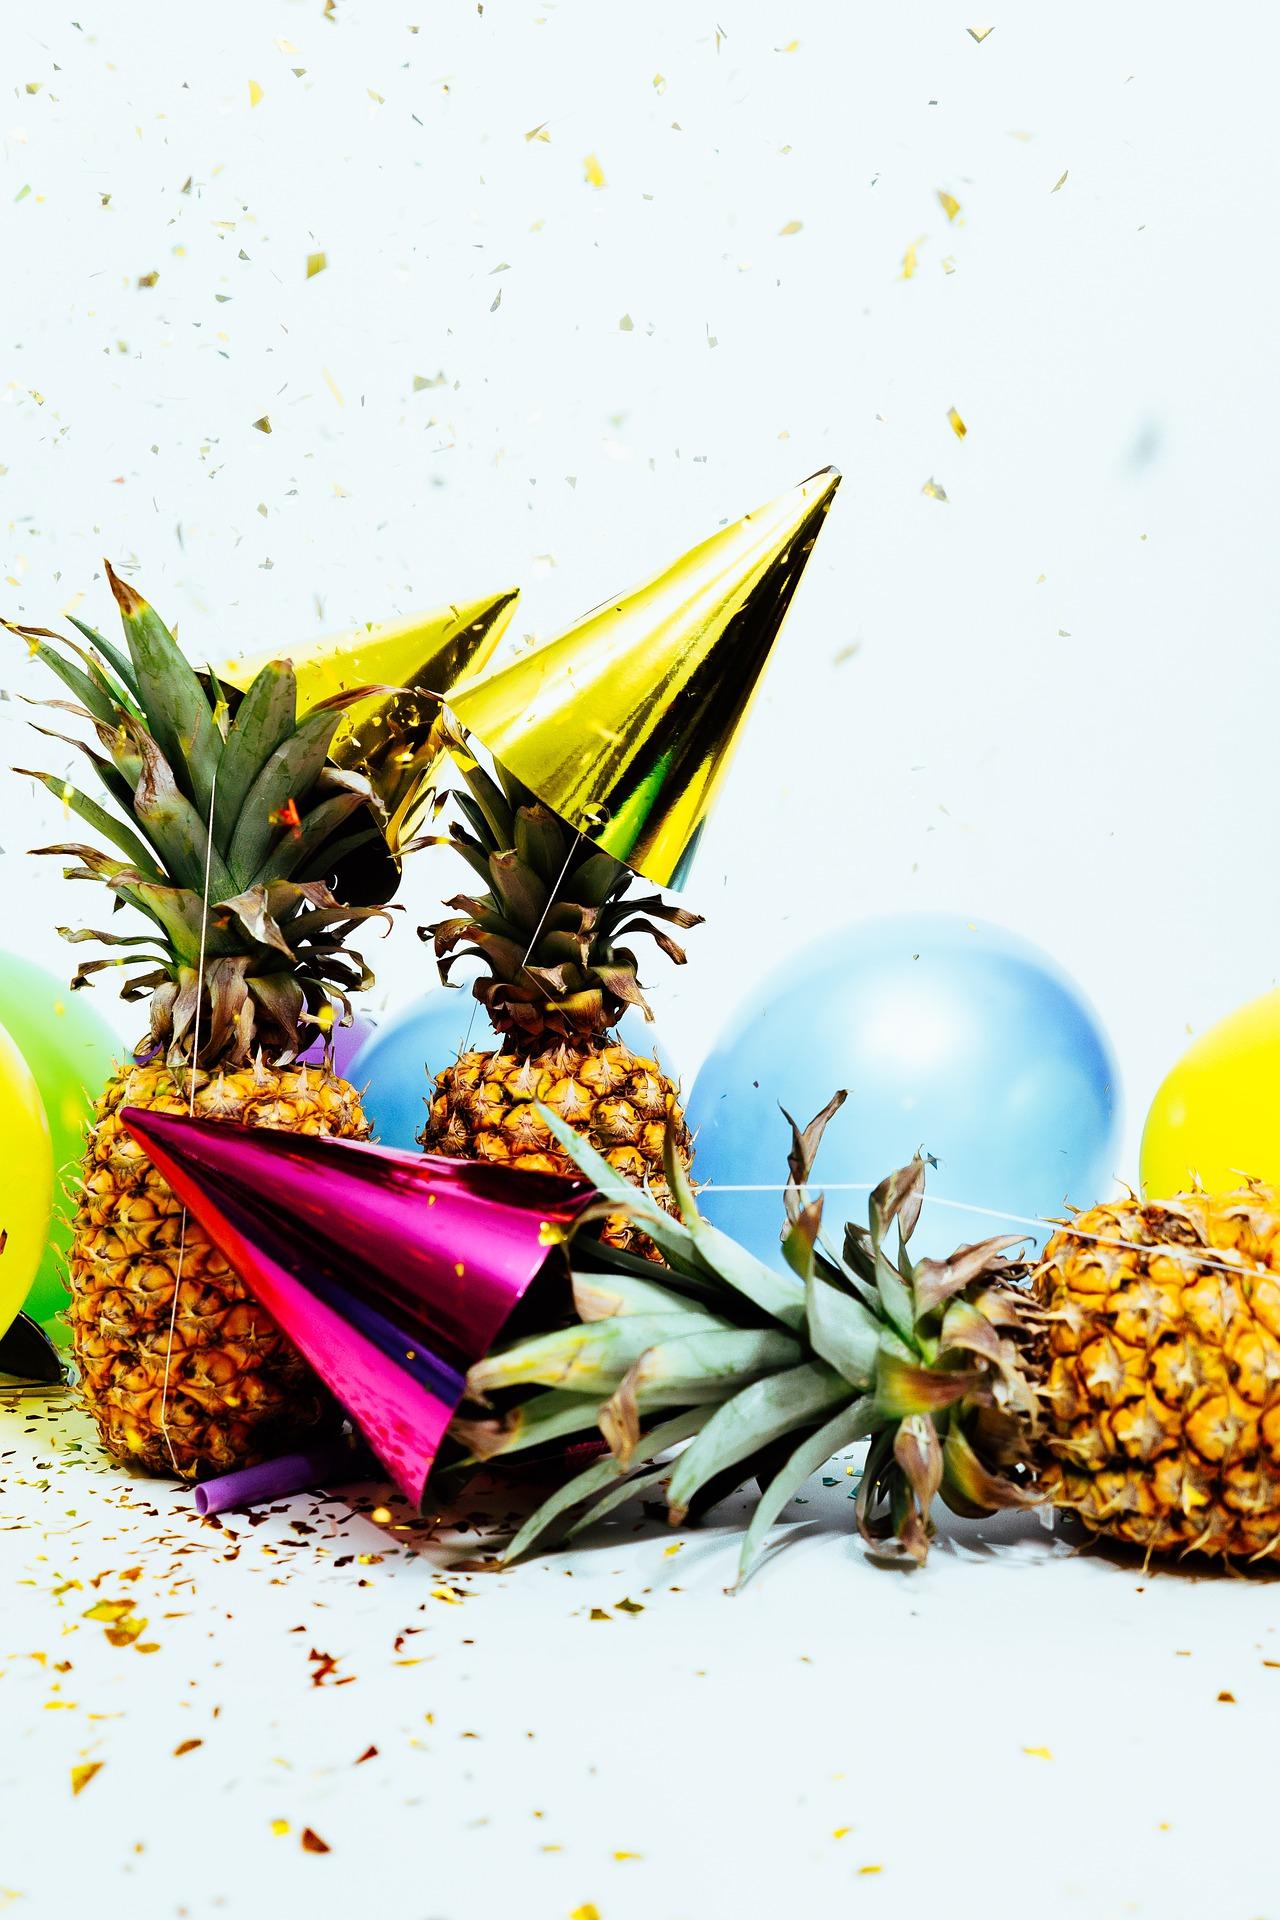 party - pineapple - hats.jpg